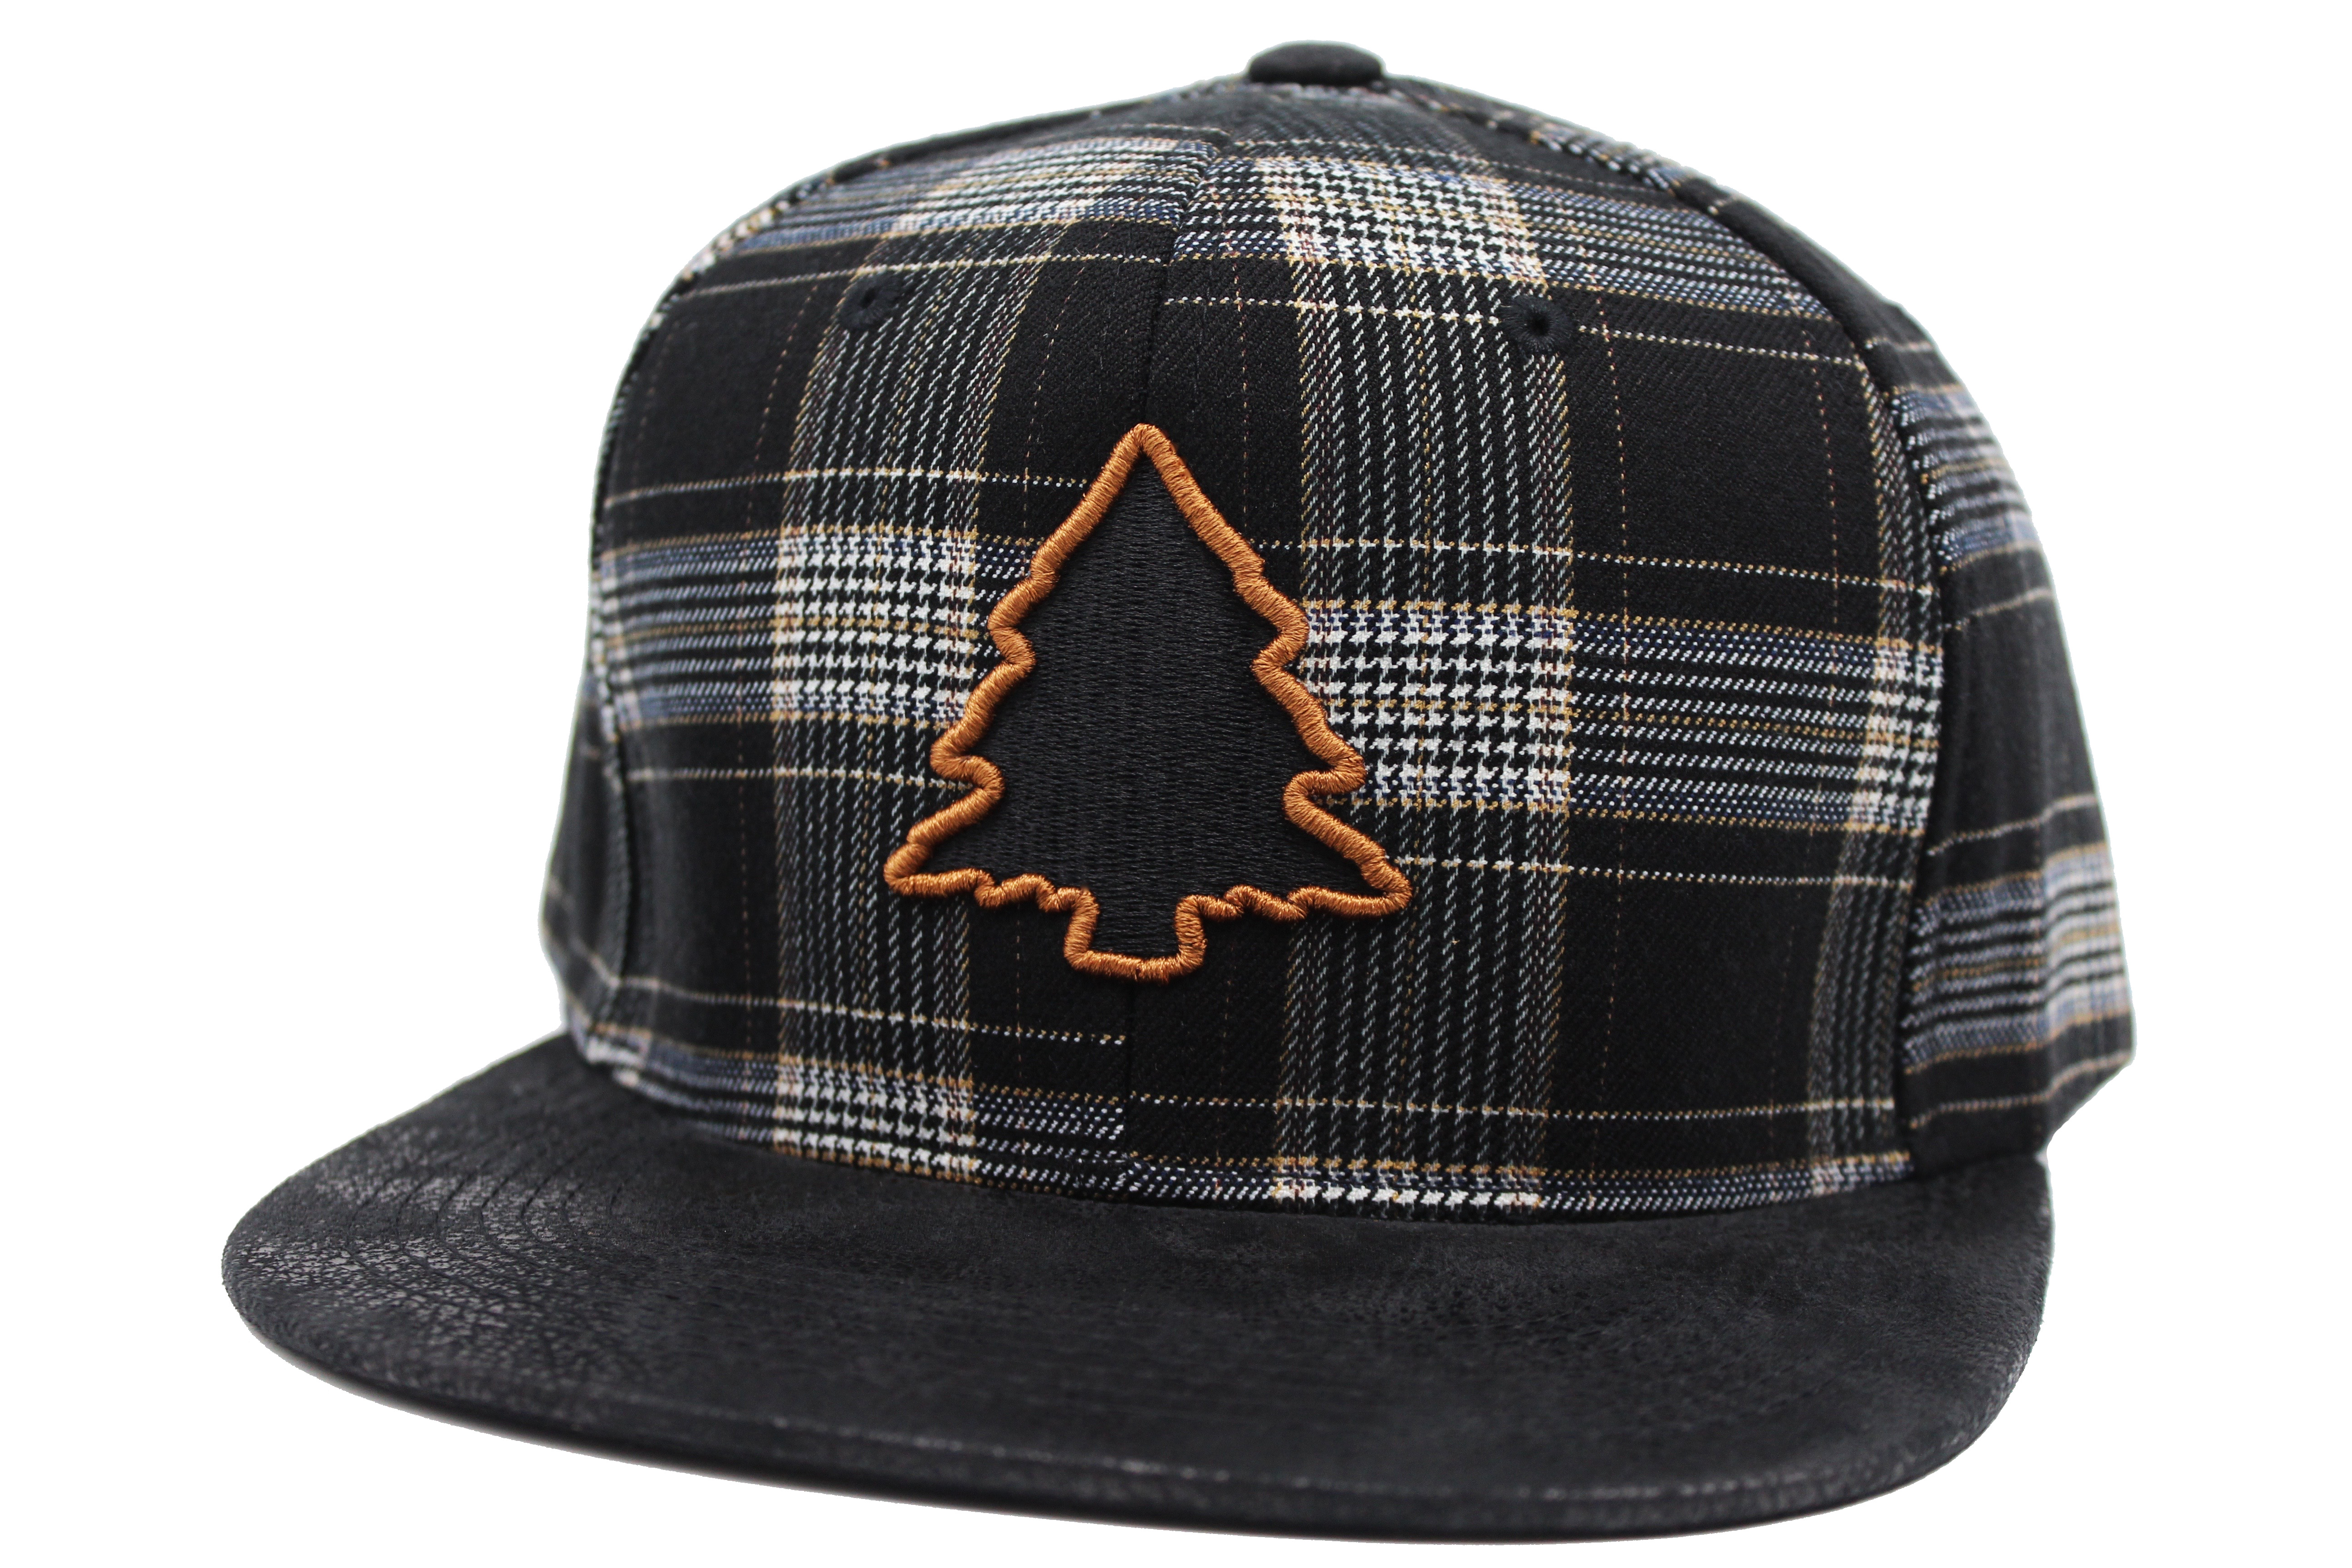 b816839a24c807 Fresh Brown Plaid & Leather Hat | Fresh Air Clothing